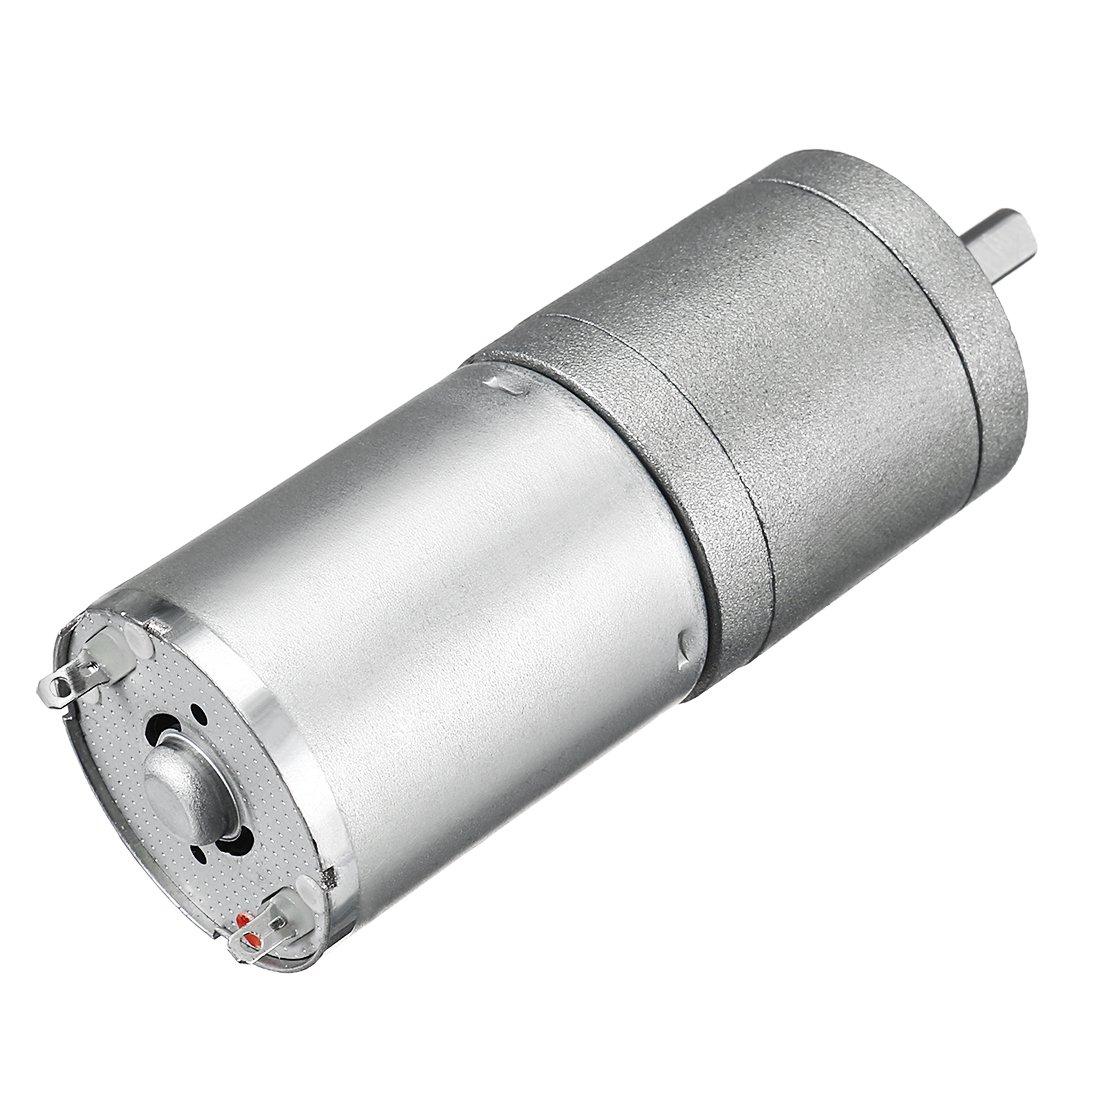 uxcell Mini 12V DC 7 RPM 118N.cm Gear Box Electric Motor